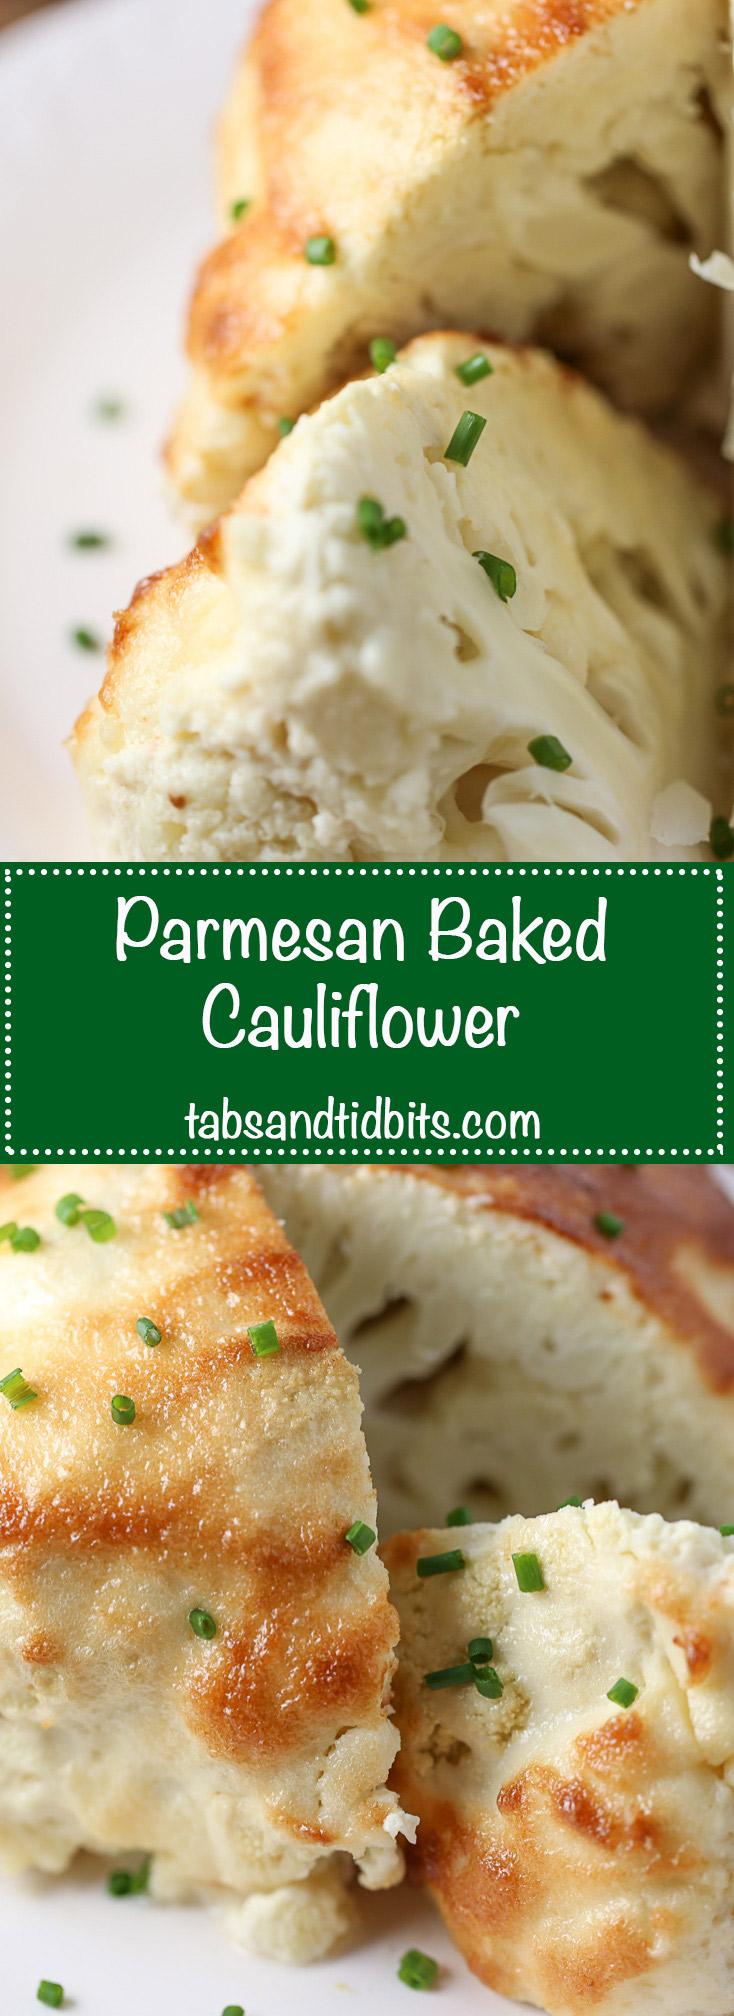 Parmesan Baked Cauliflower